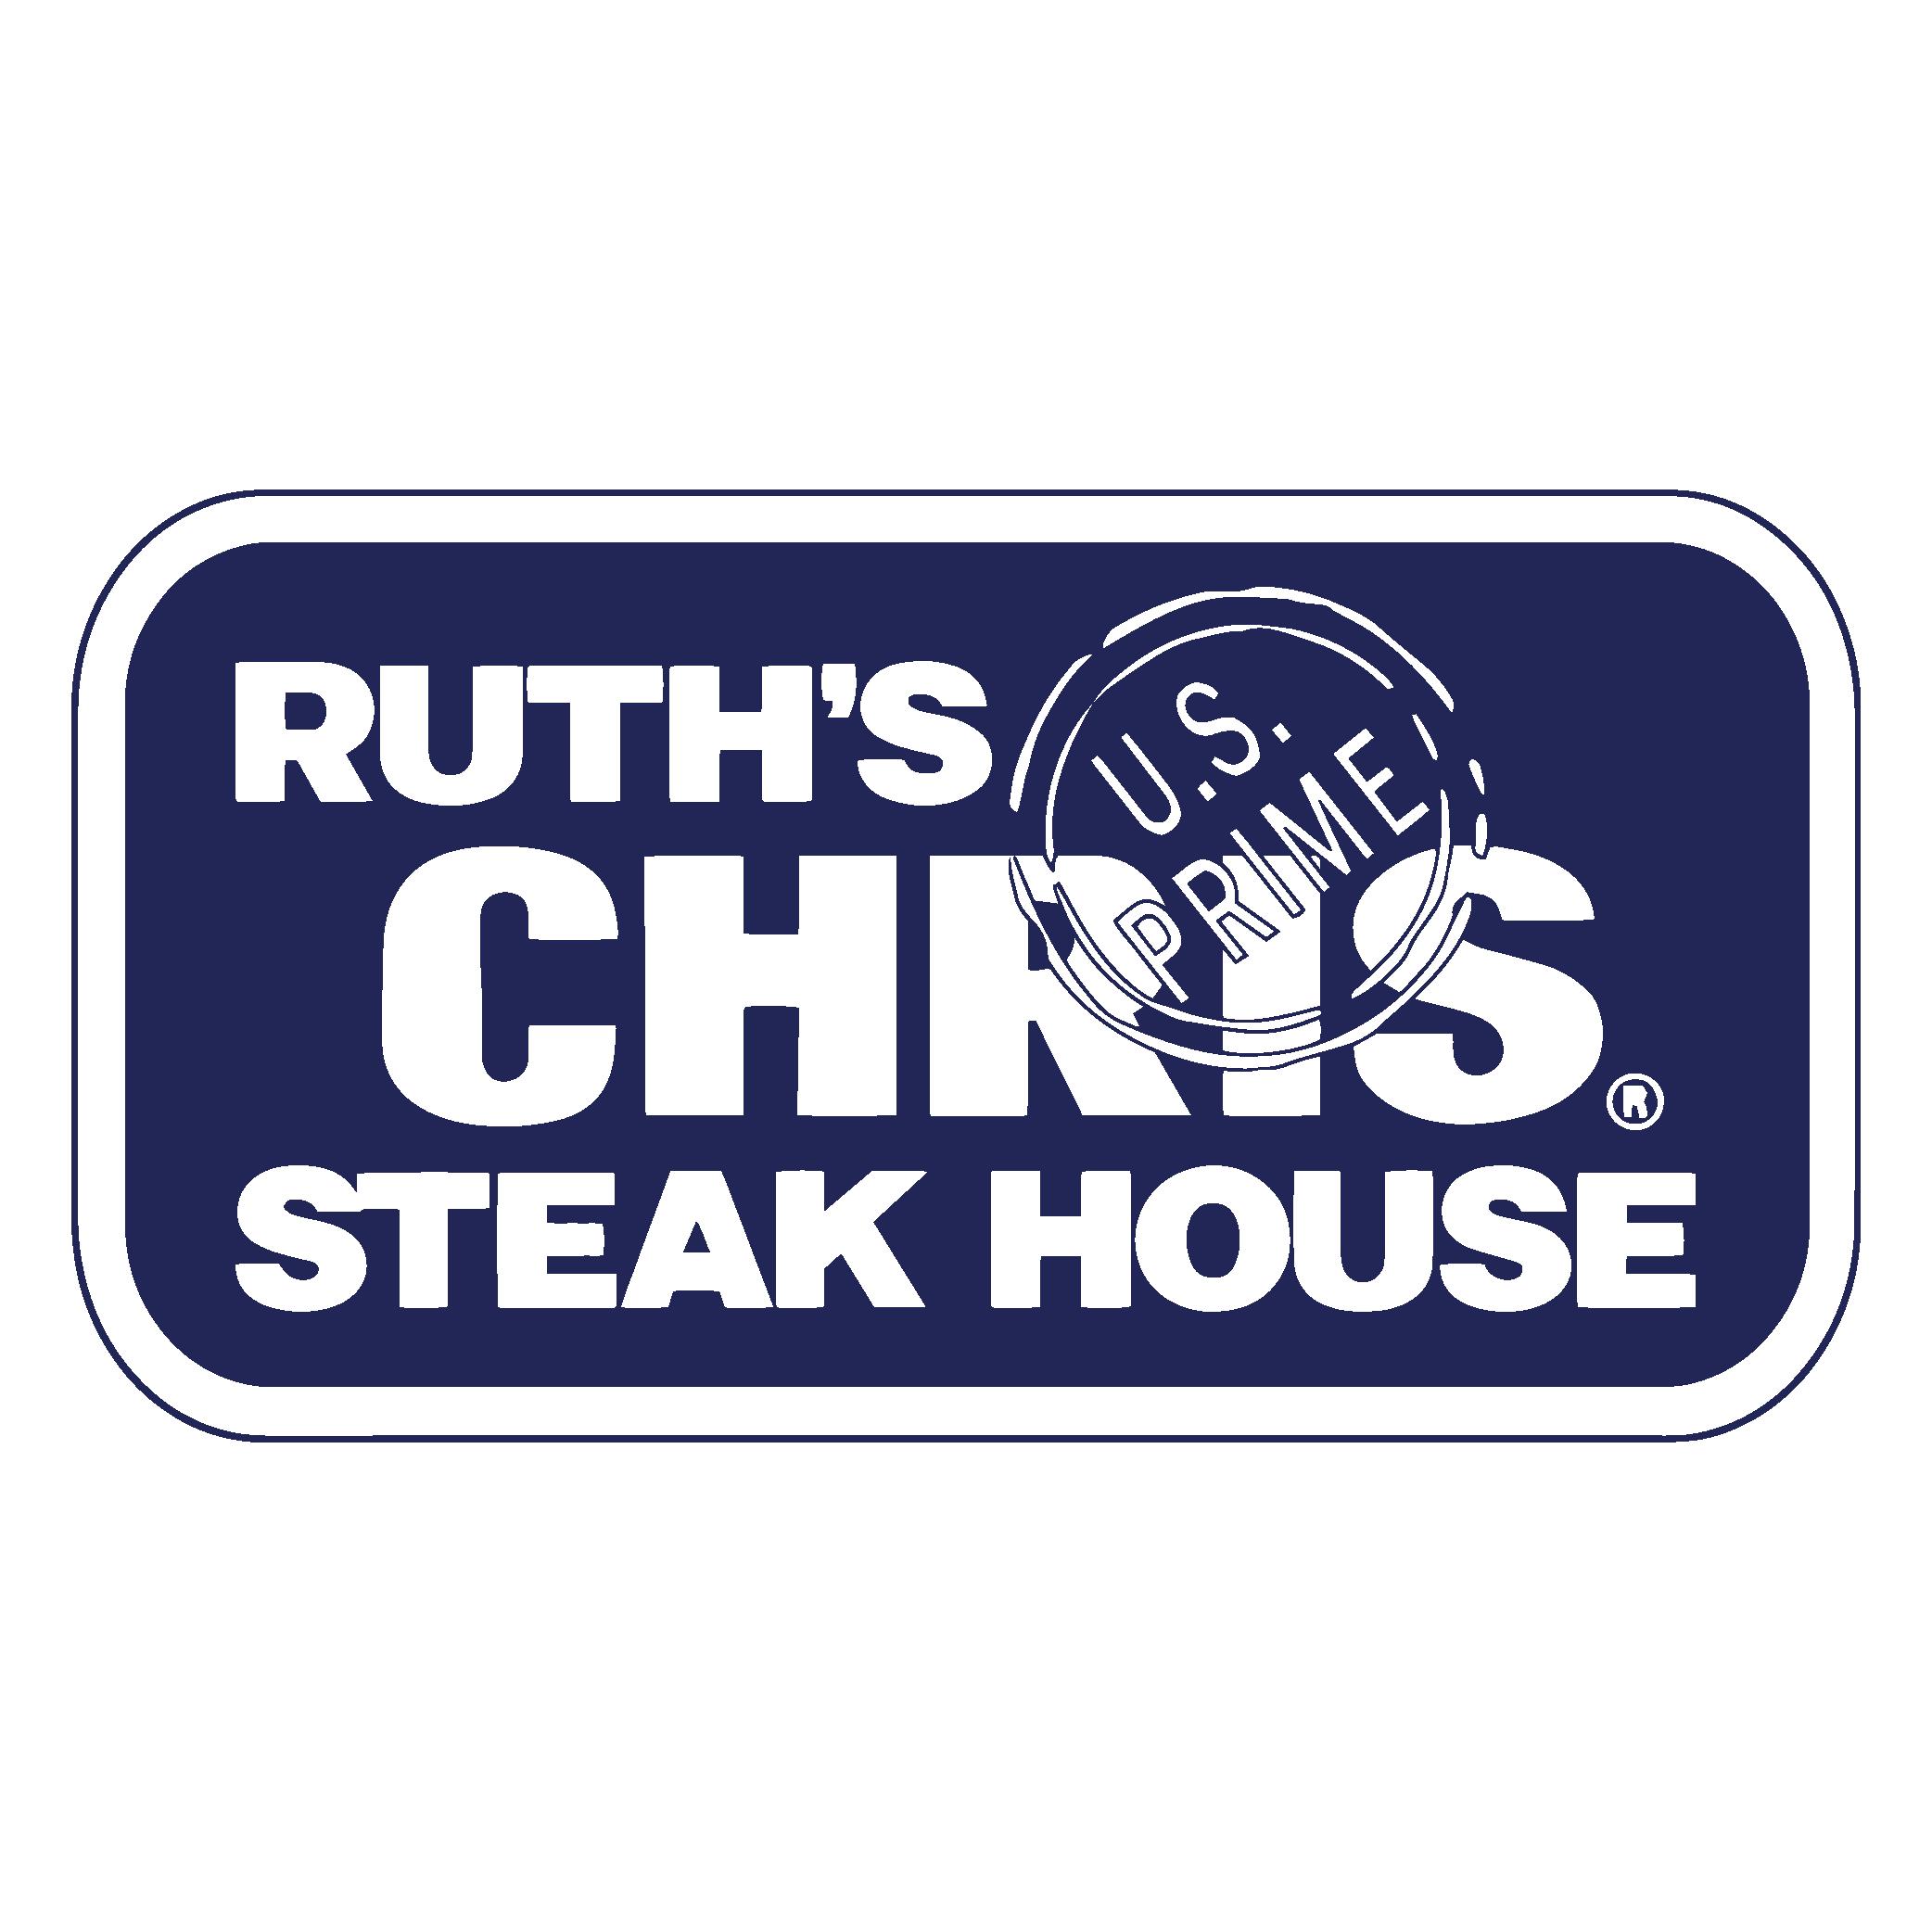 ruths chris steak house logo